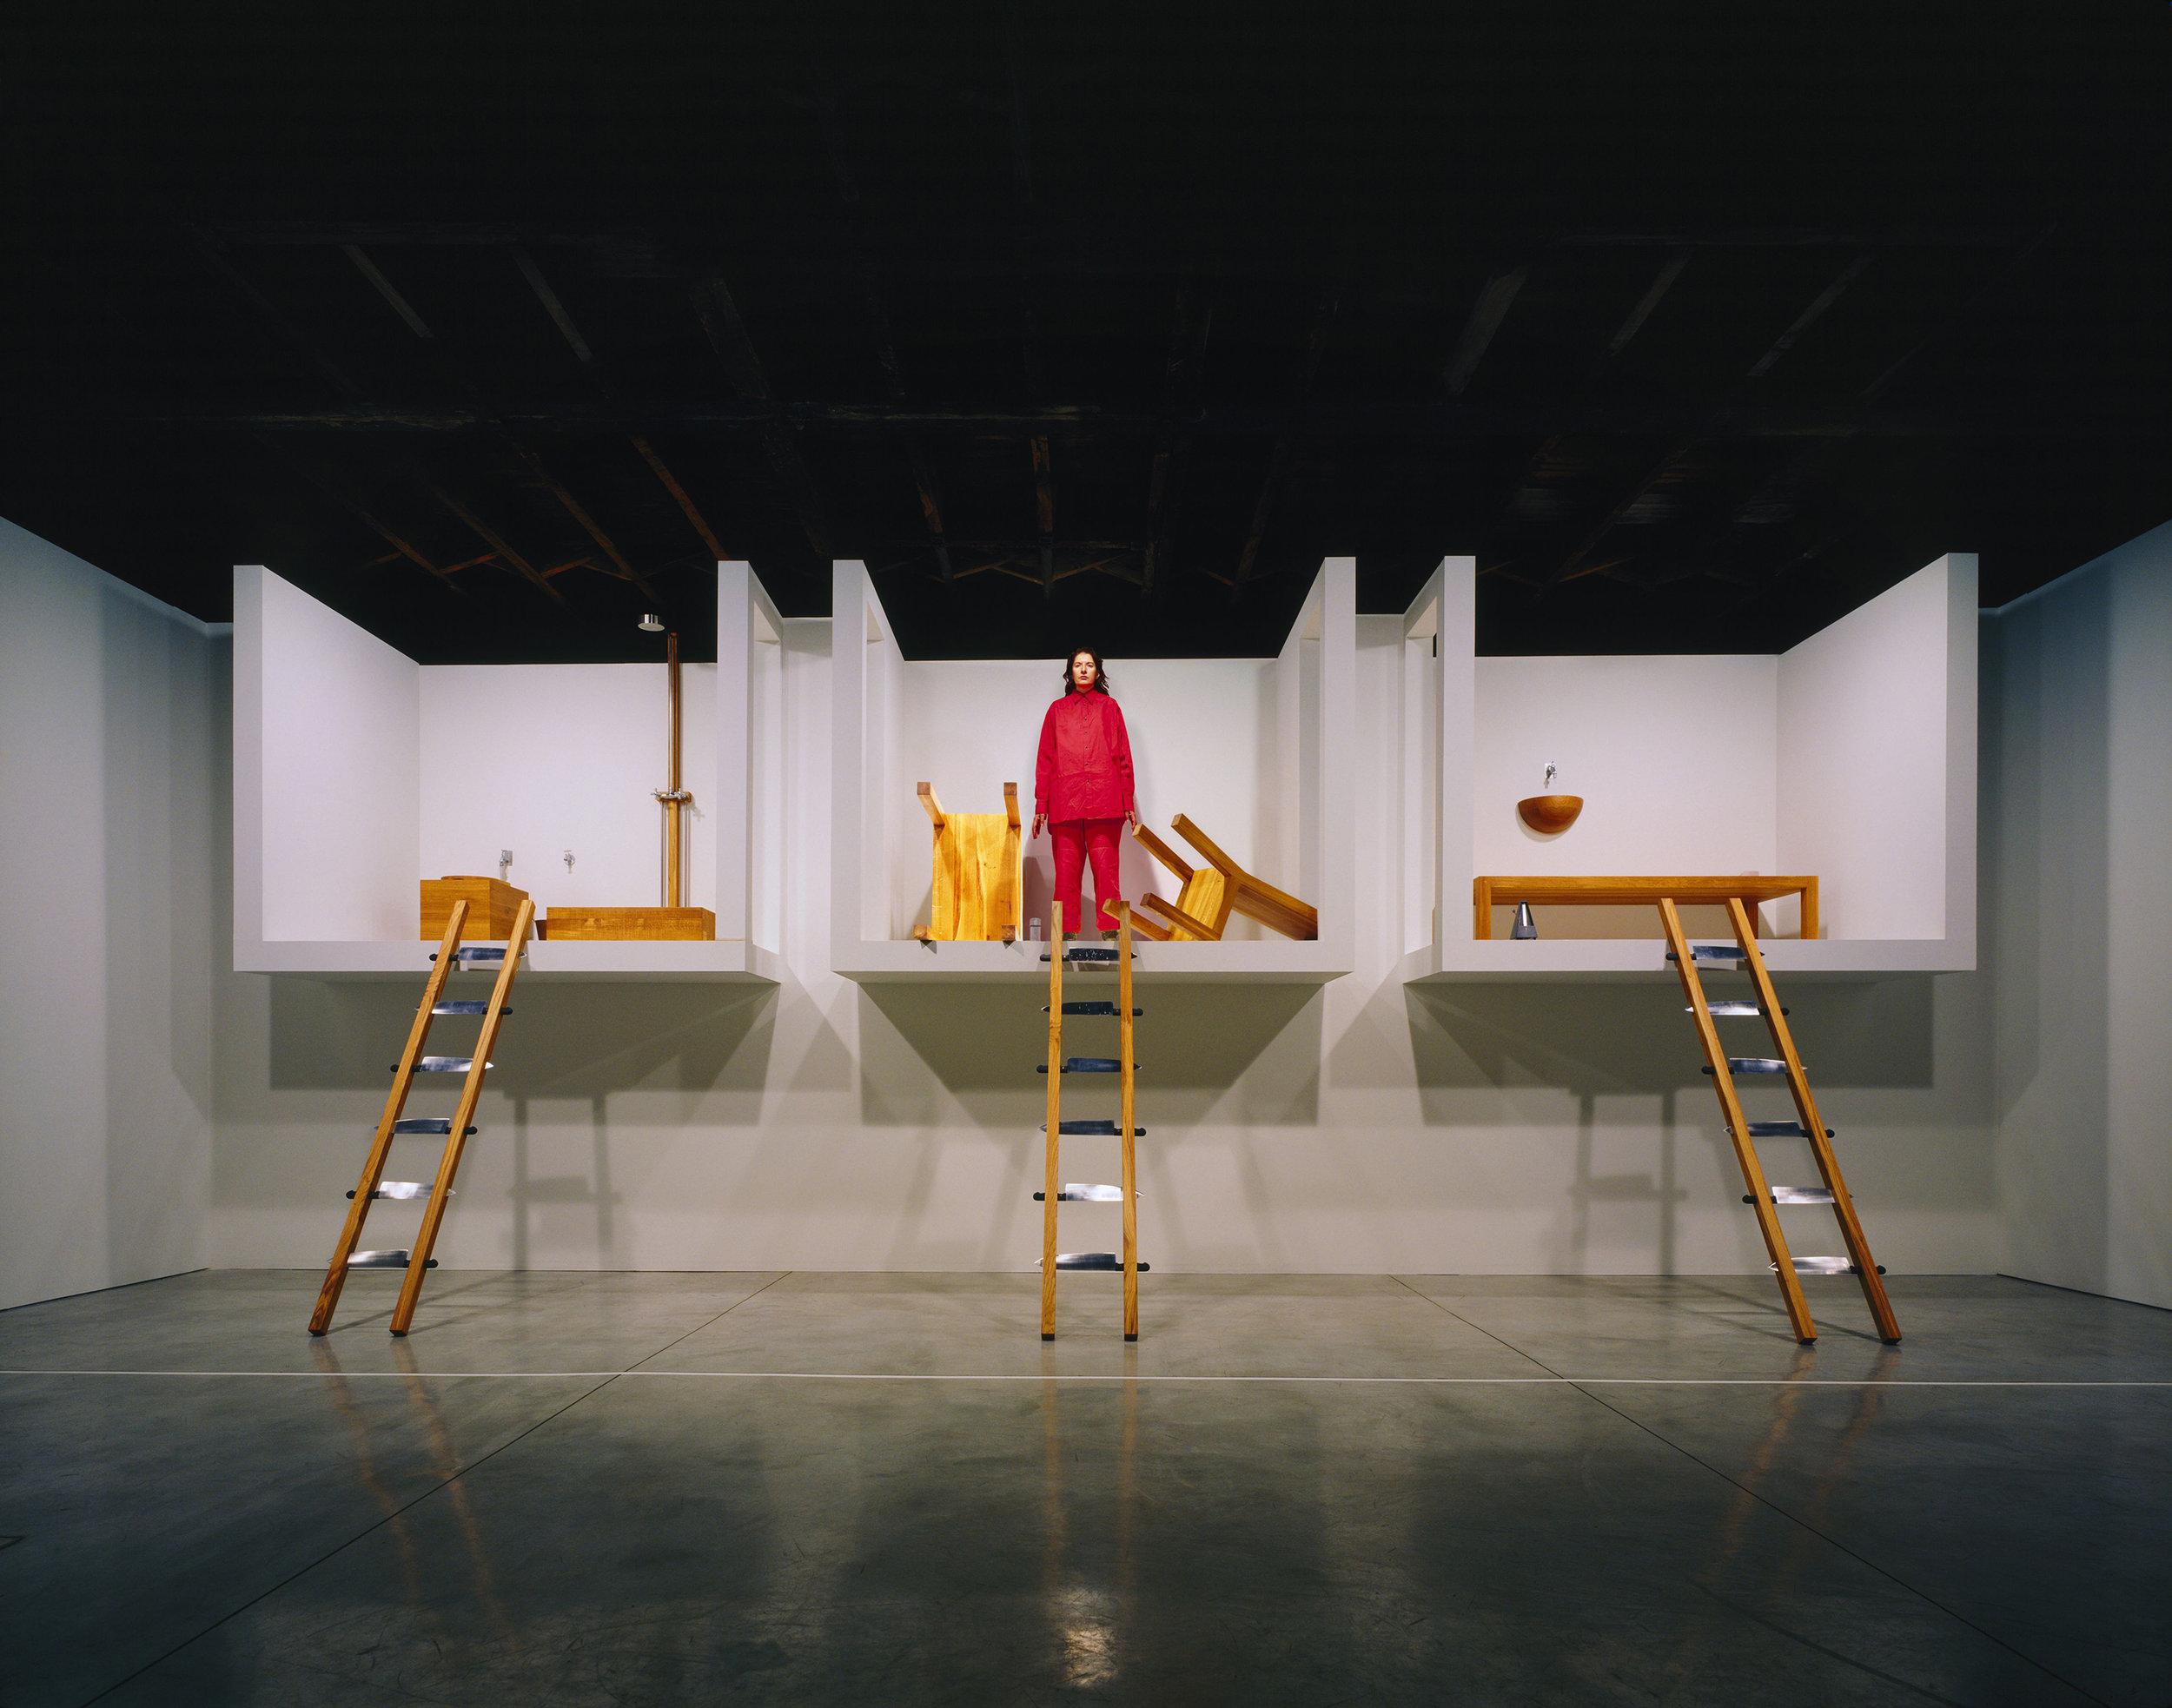 Marina Abramović, The House with The Ocean View, 2002 Performance, 12 days Sean Kelly Gallery, New York, 2002 © Marina Abramović/Bildupphovsrätt 2017 Photo: © Attilio Maranzano Courtesy of the Marina Abramović Archives